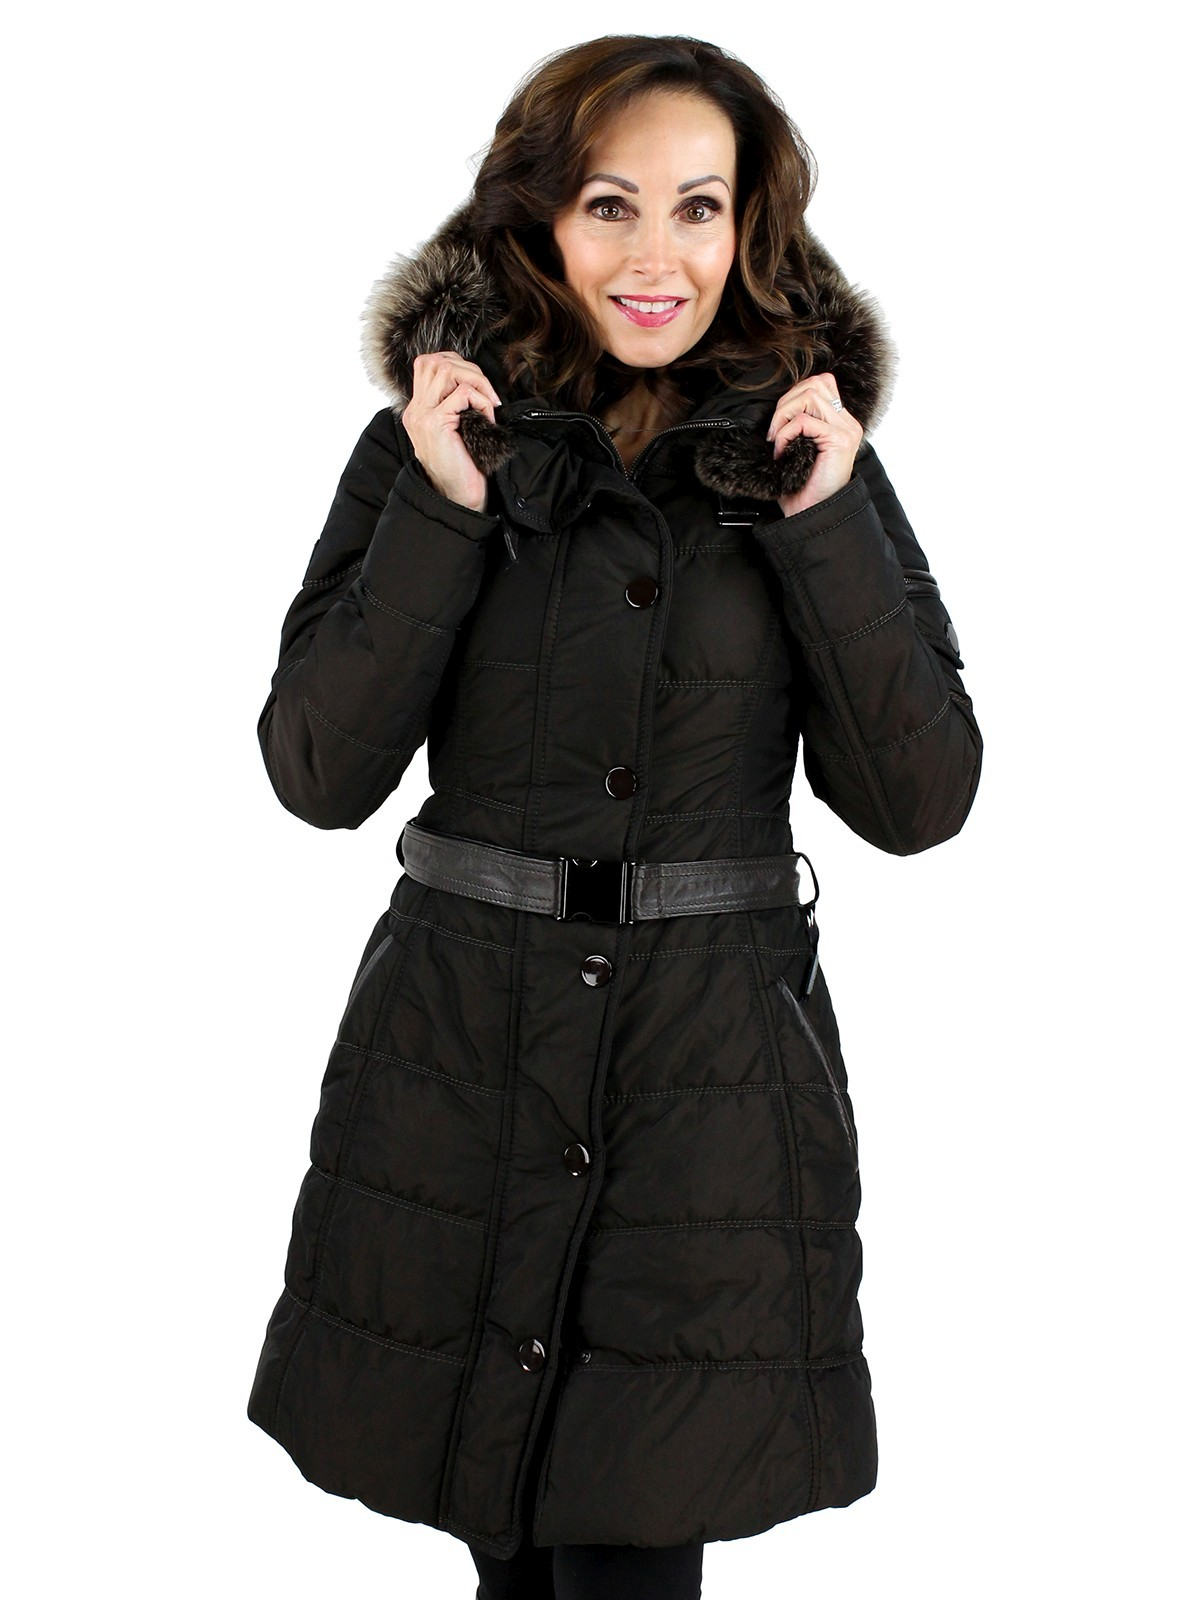 Gorski Woman's Espresso Apres Woman's Fabric Ski Jacket with Fox Trimmed Hood